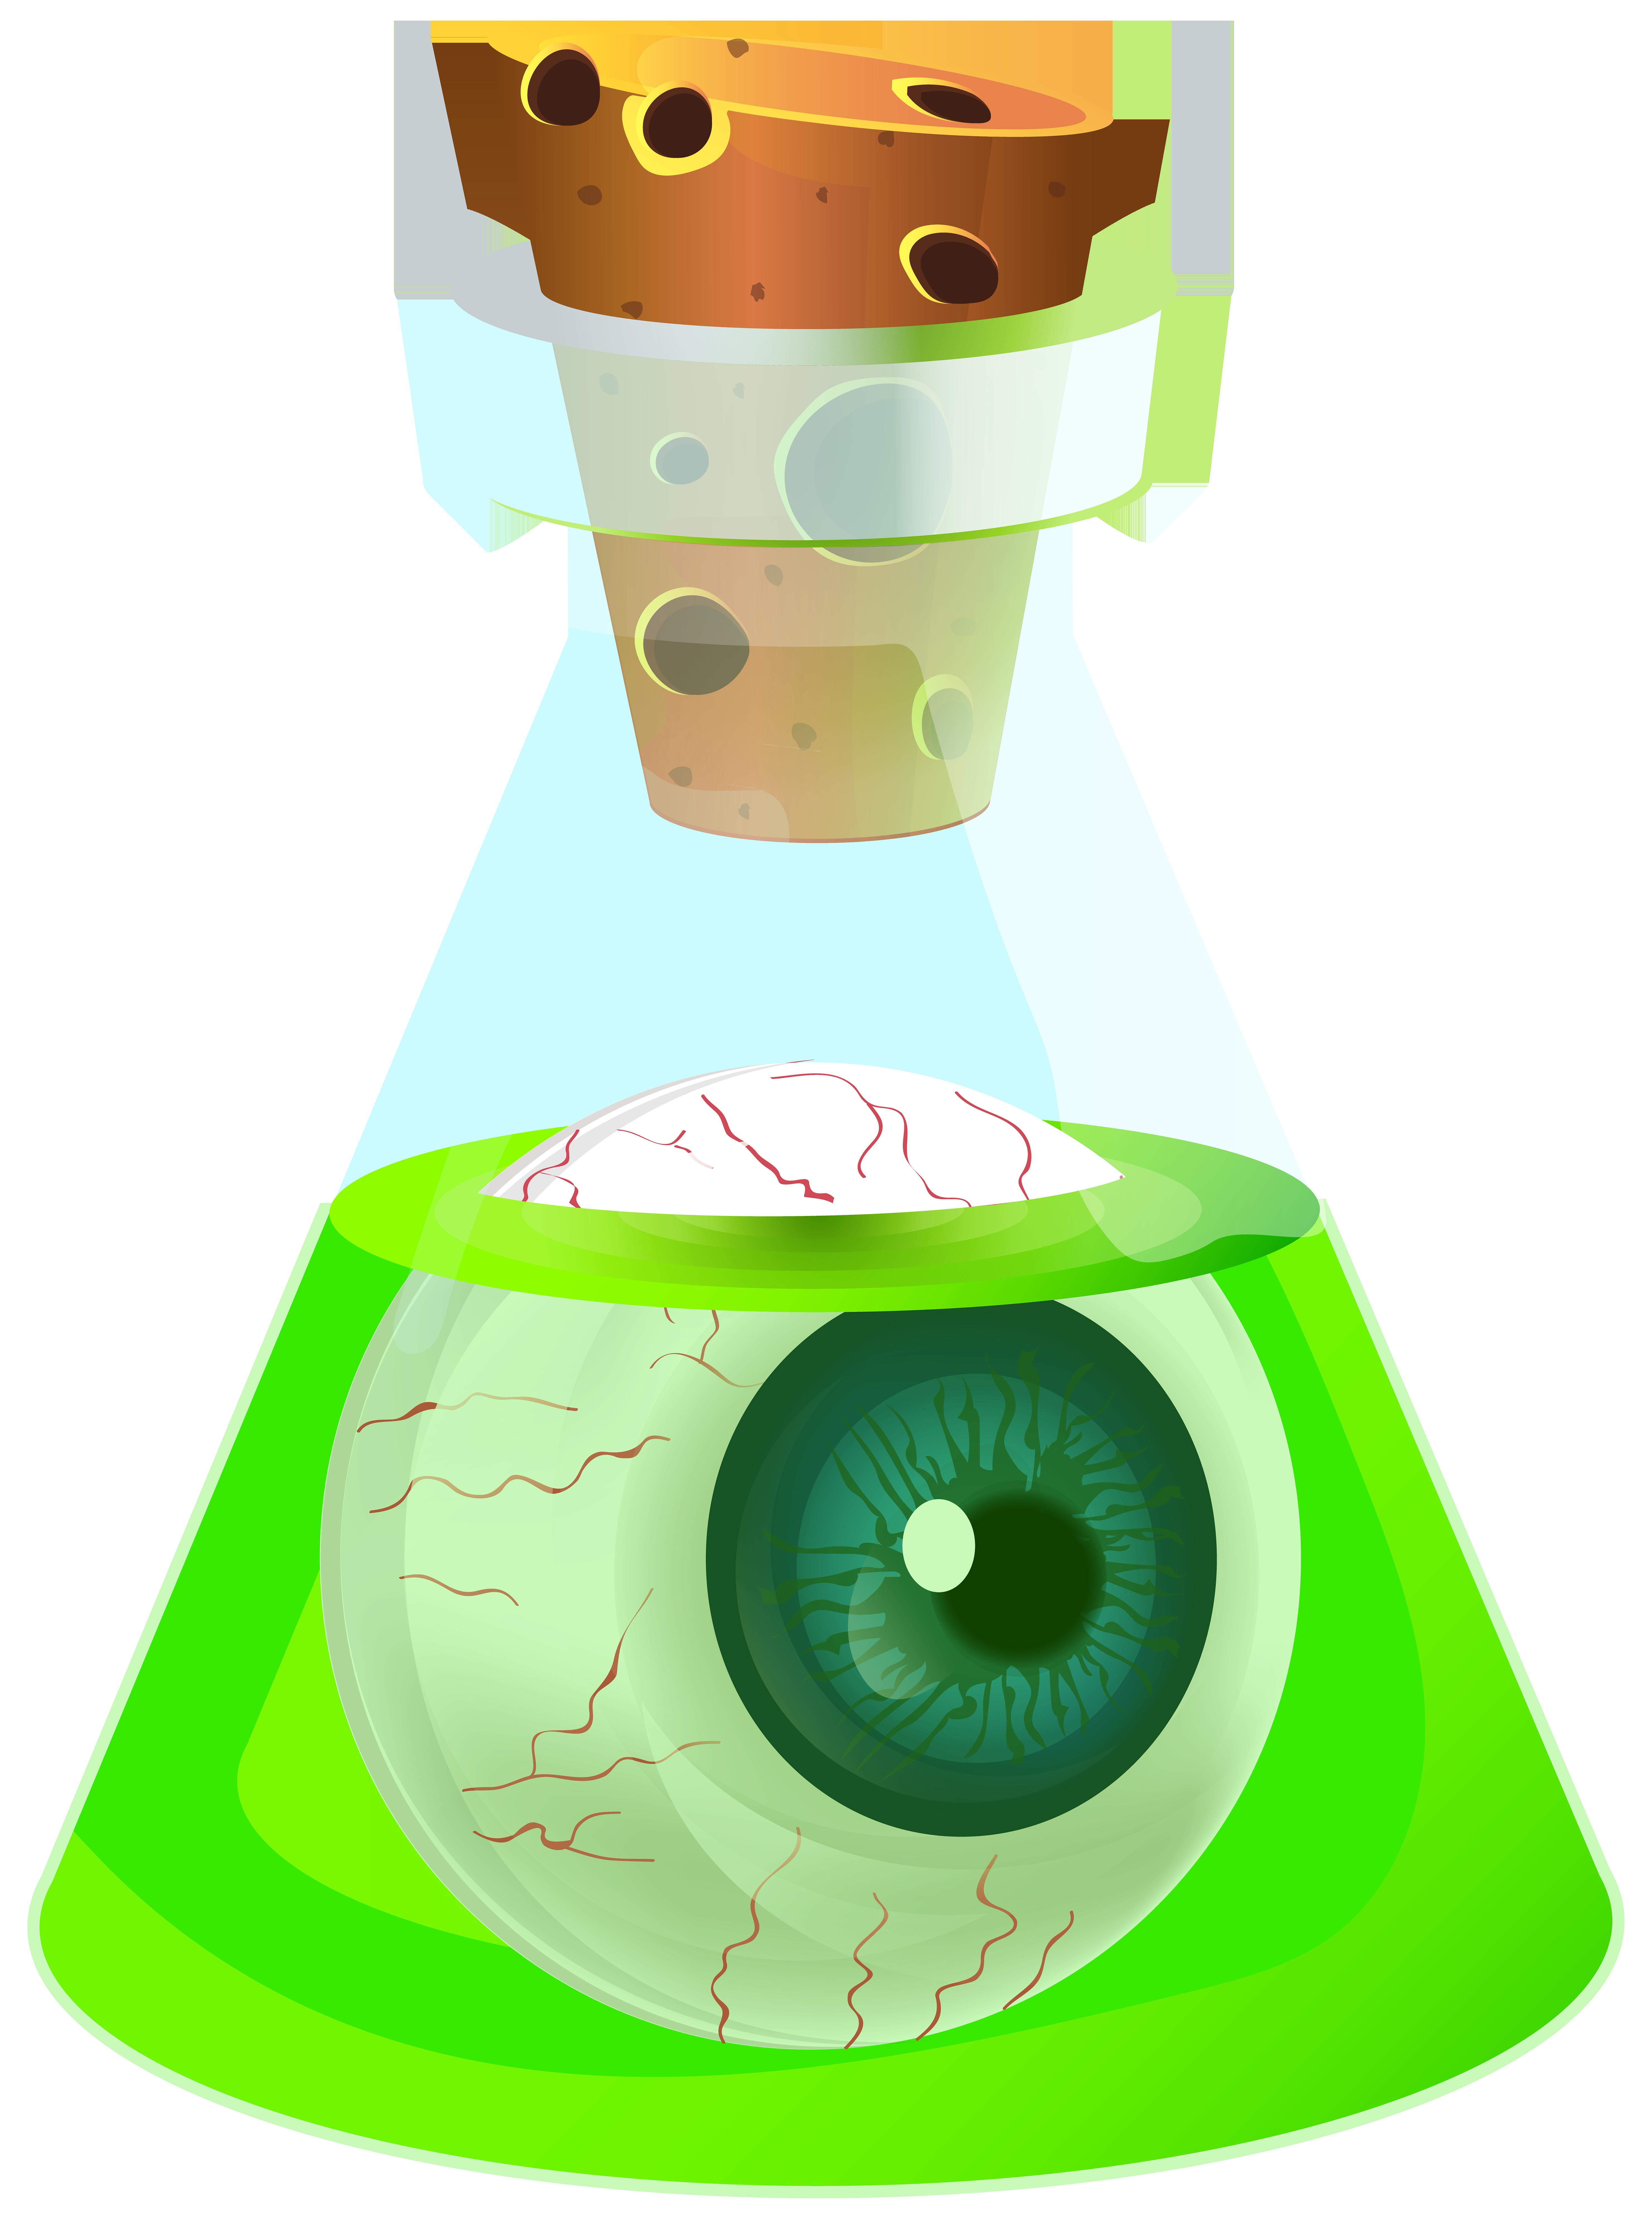 Poison potion with eyeball. Eyeballs clipart halloween